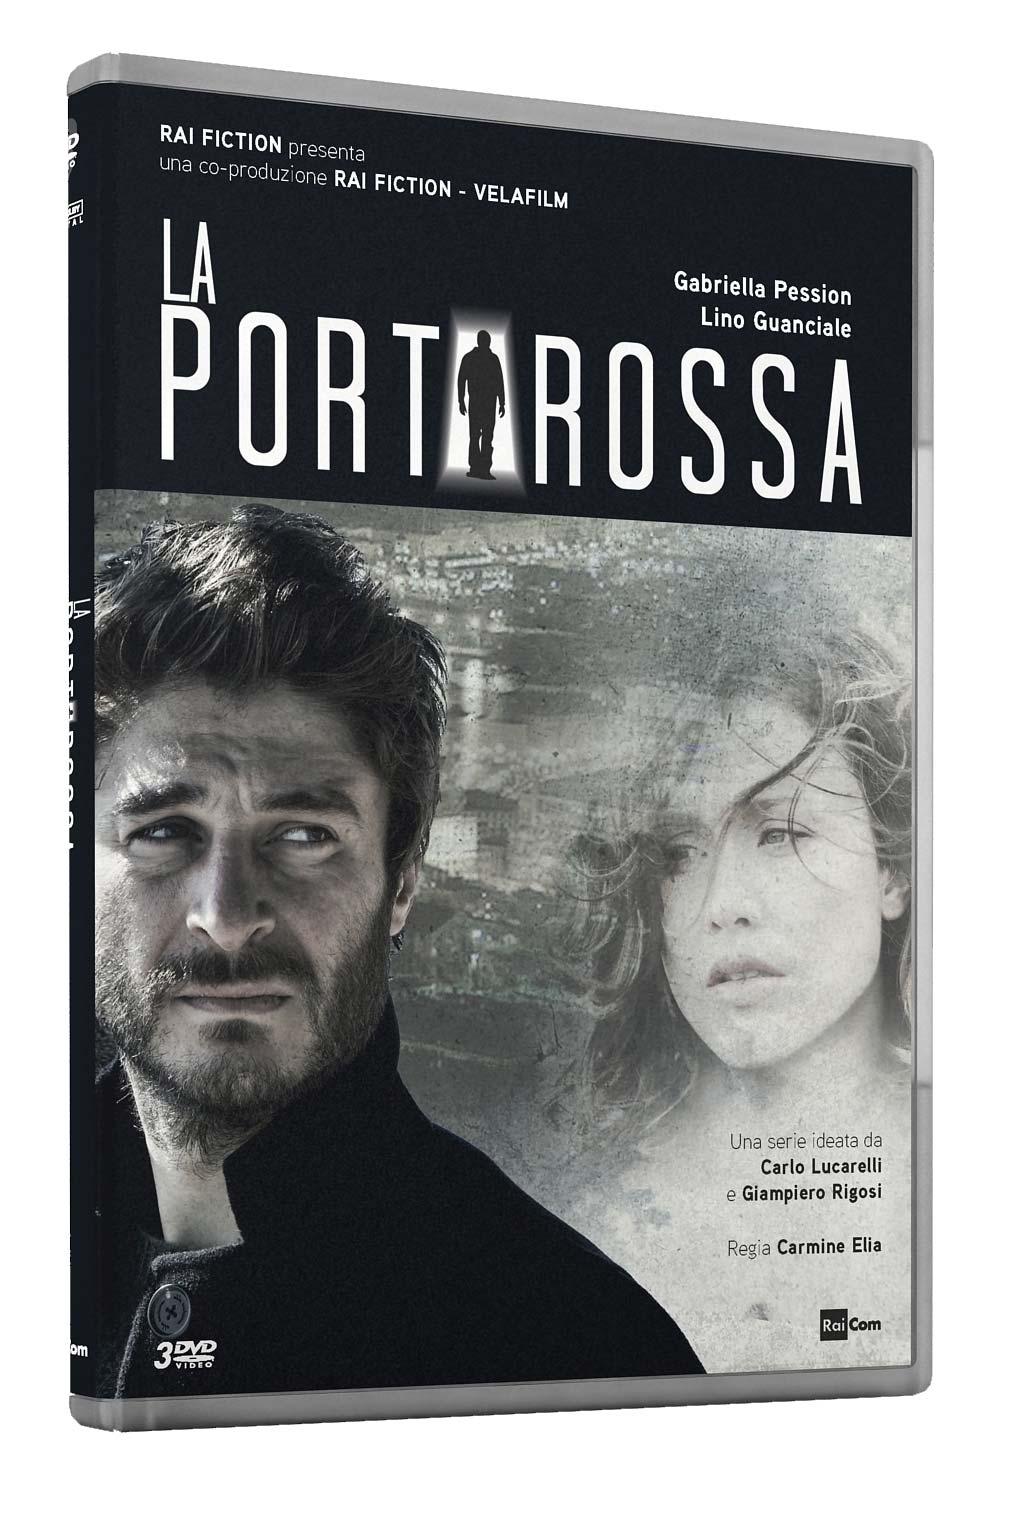 COF.LA PORTA ROSSA (3 DVD+CD) (DVD)